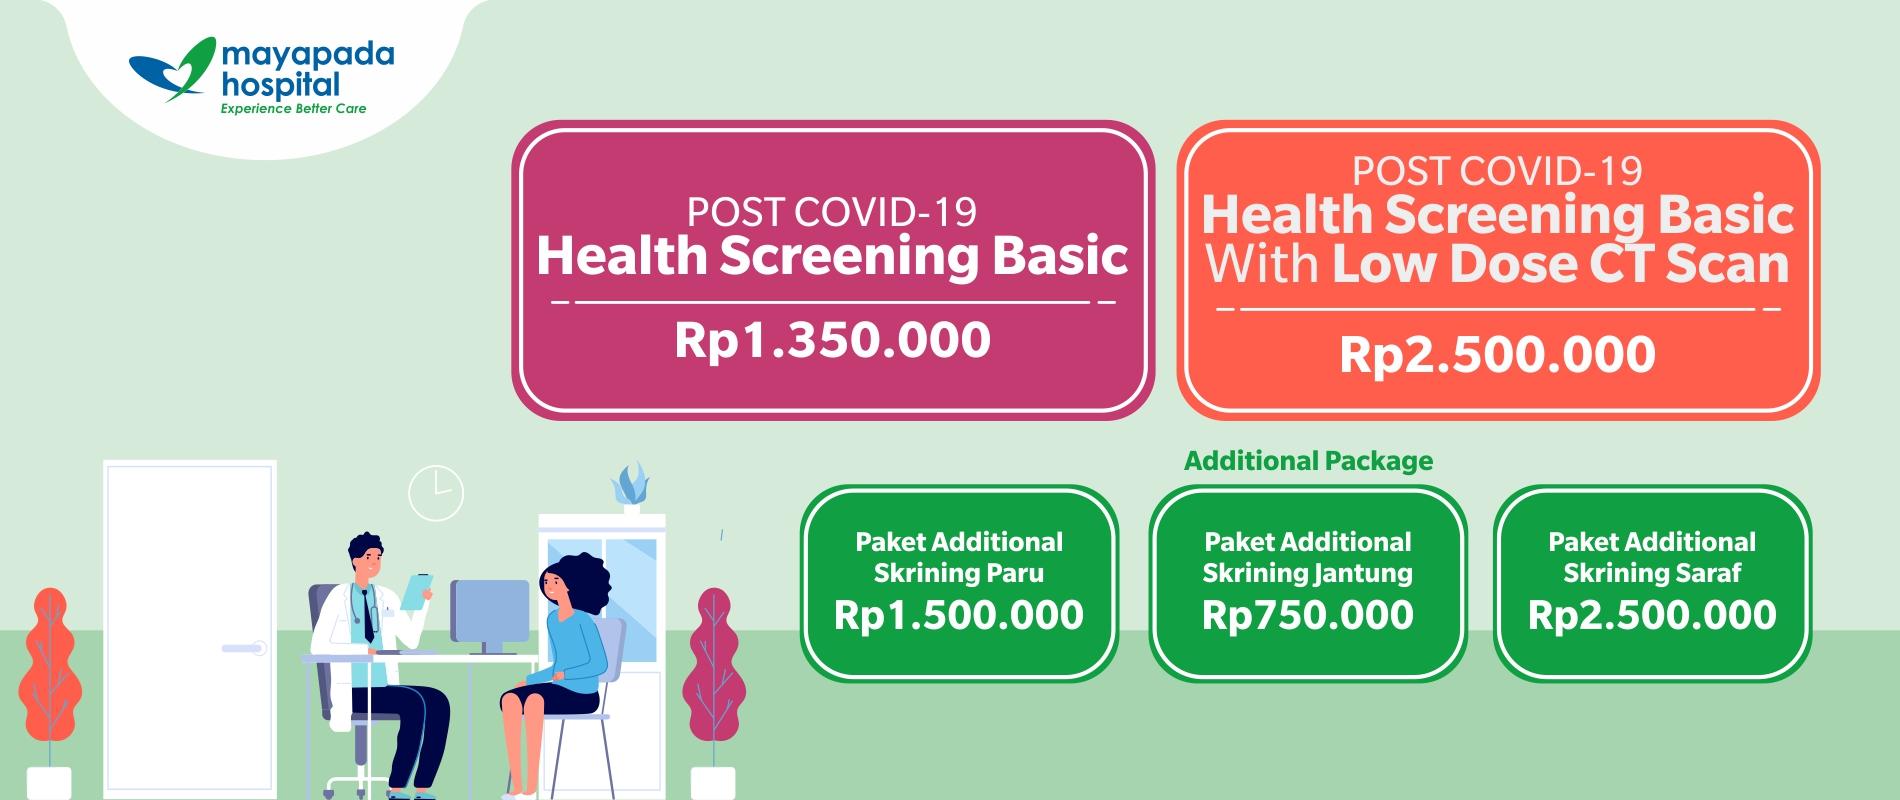 Paket Kesehatan Post Covid Recovery & Rehabilitation IMG